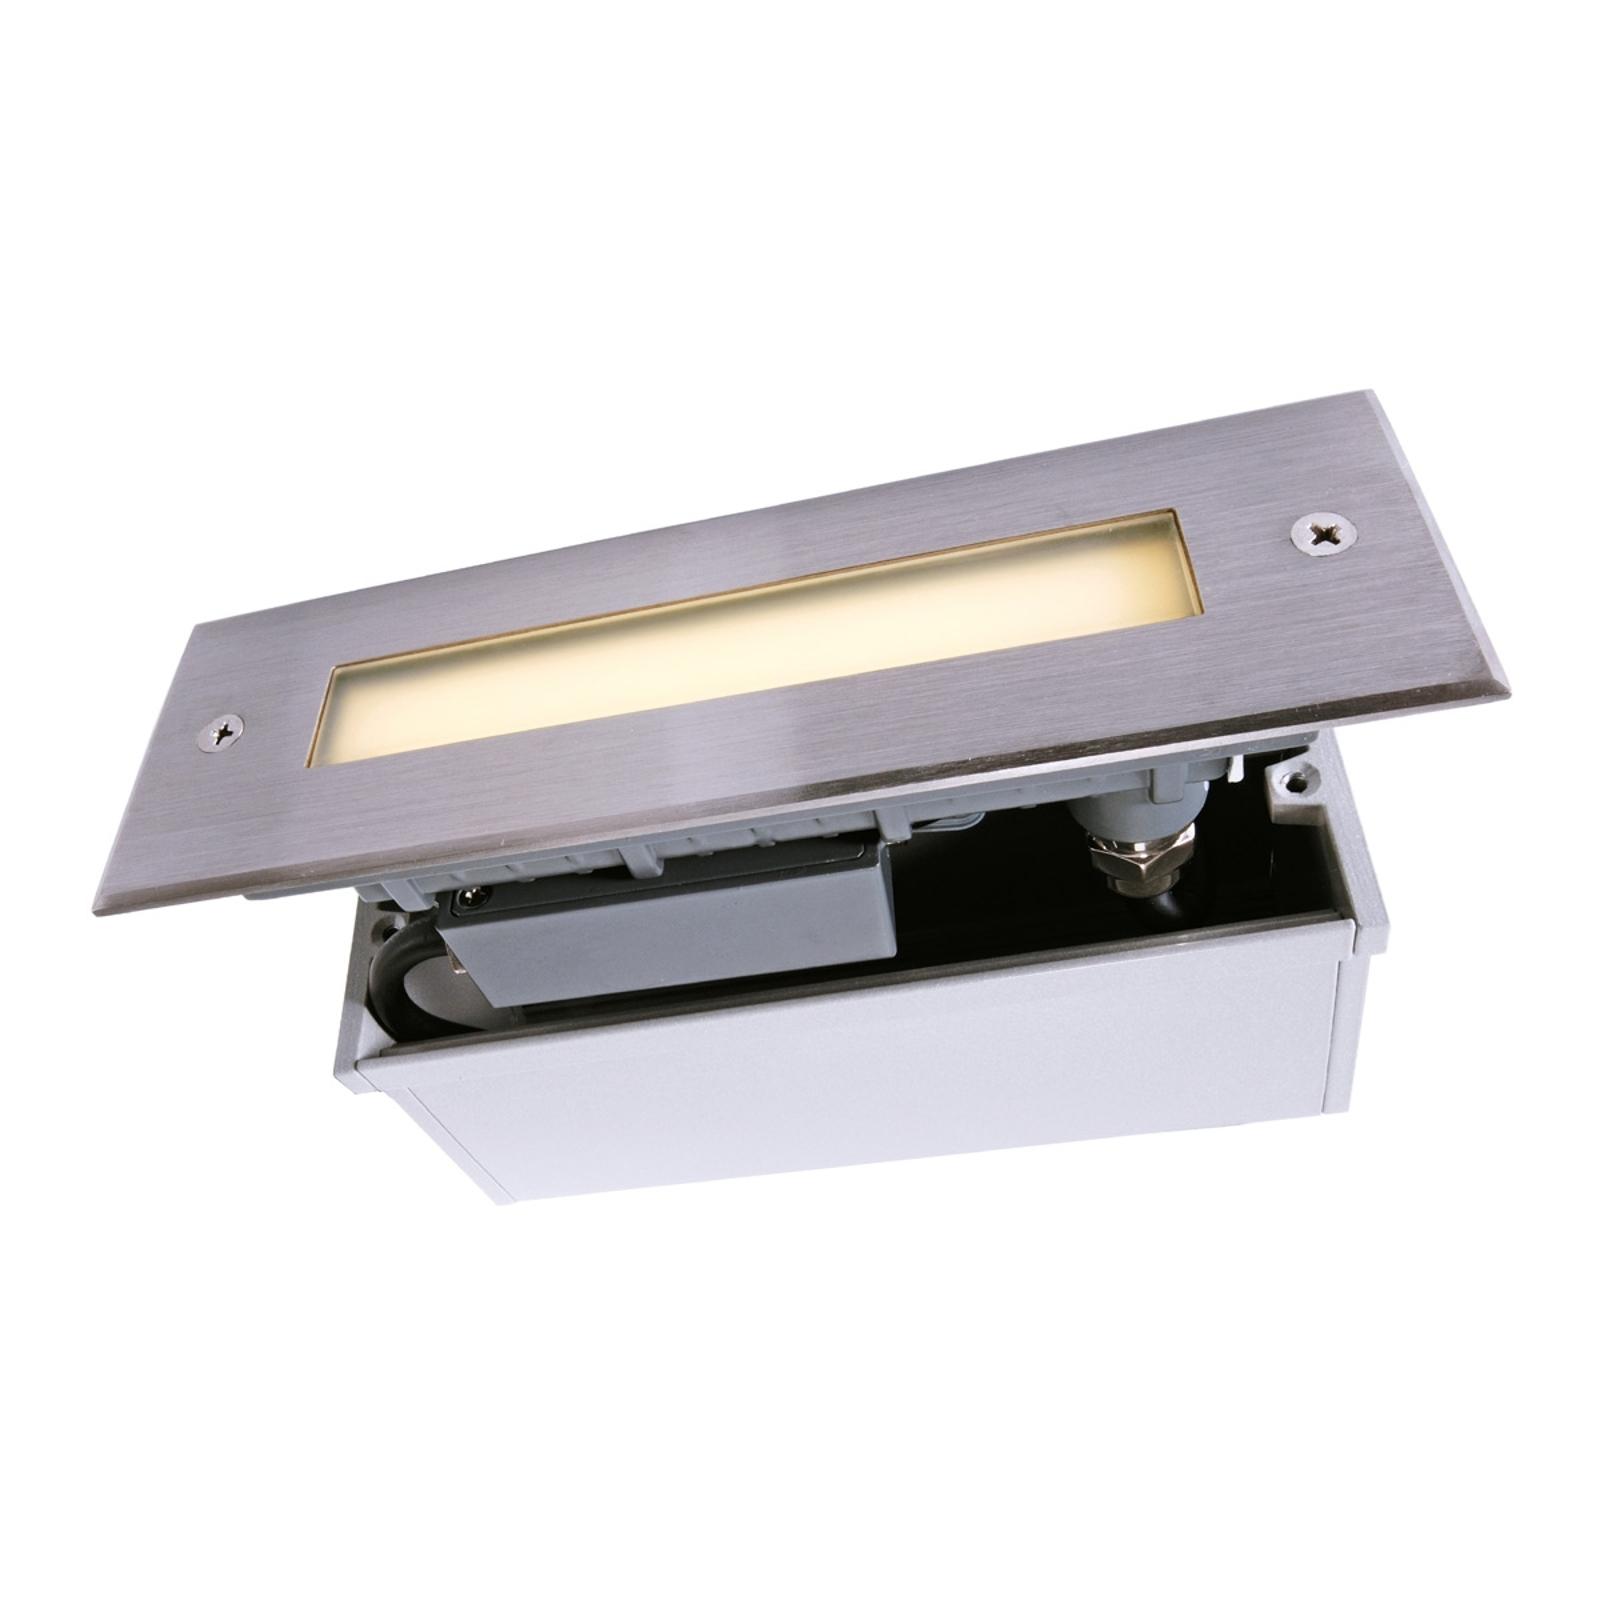 LED recessed floor light Line, 18.3 cm long_2501955_1